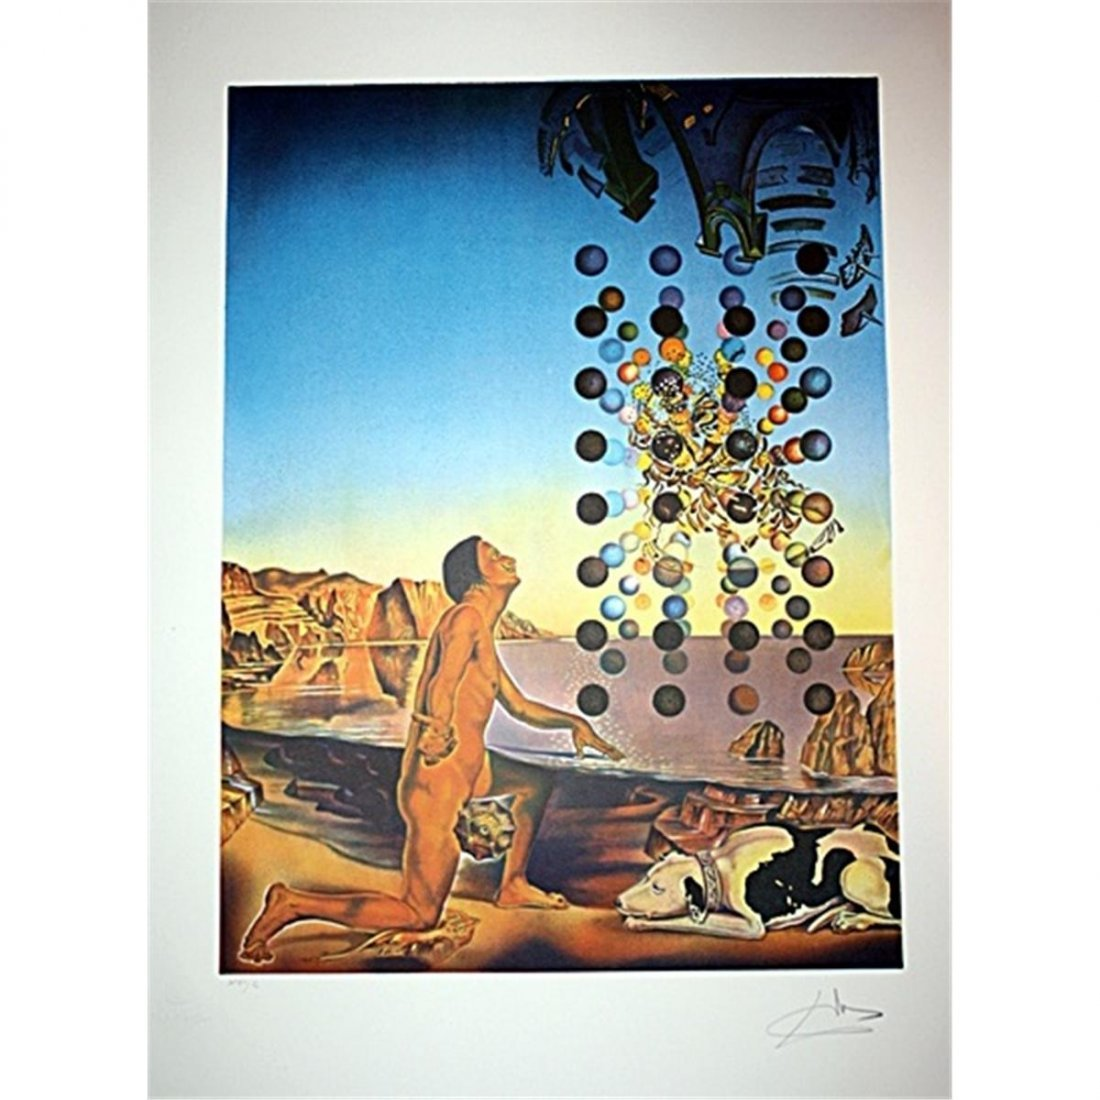 Dali Original Handsigned & Number Litho-Dali,Dali,Dali